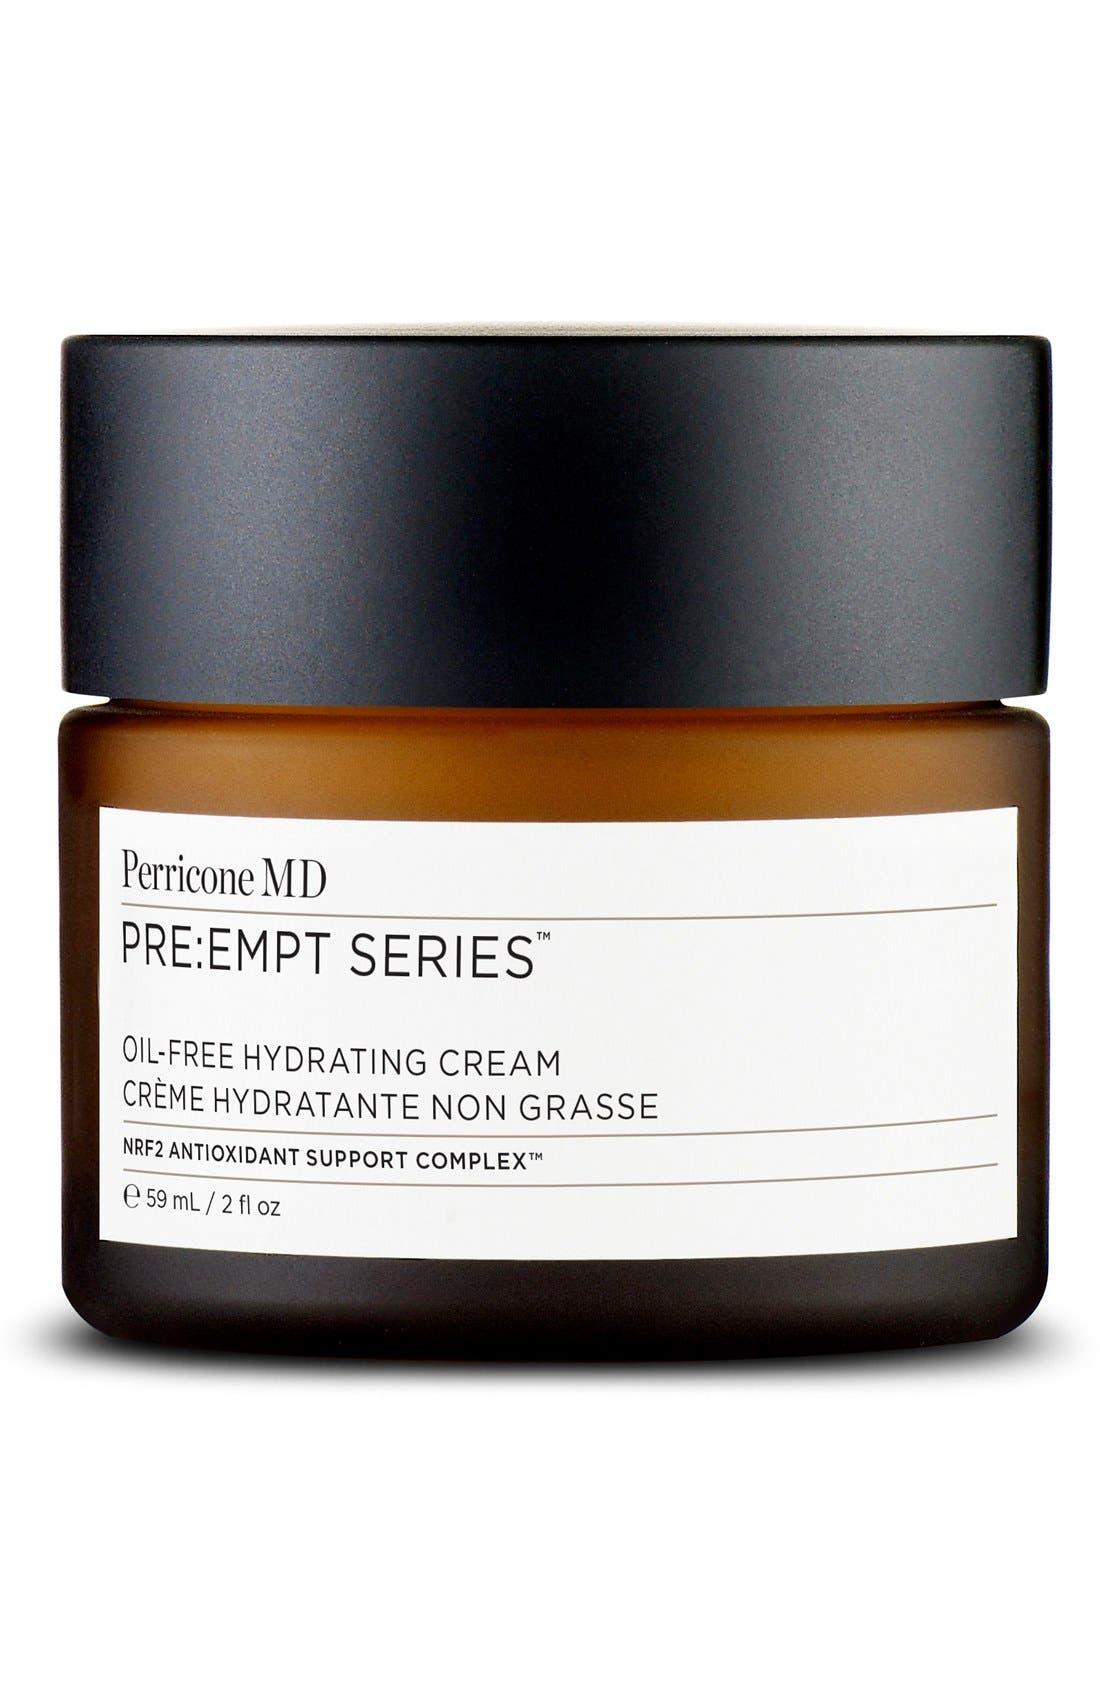 Perricone MD PRE EMPT SERIES™ Oil-Free Hydrating Cream